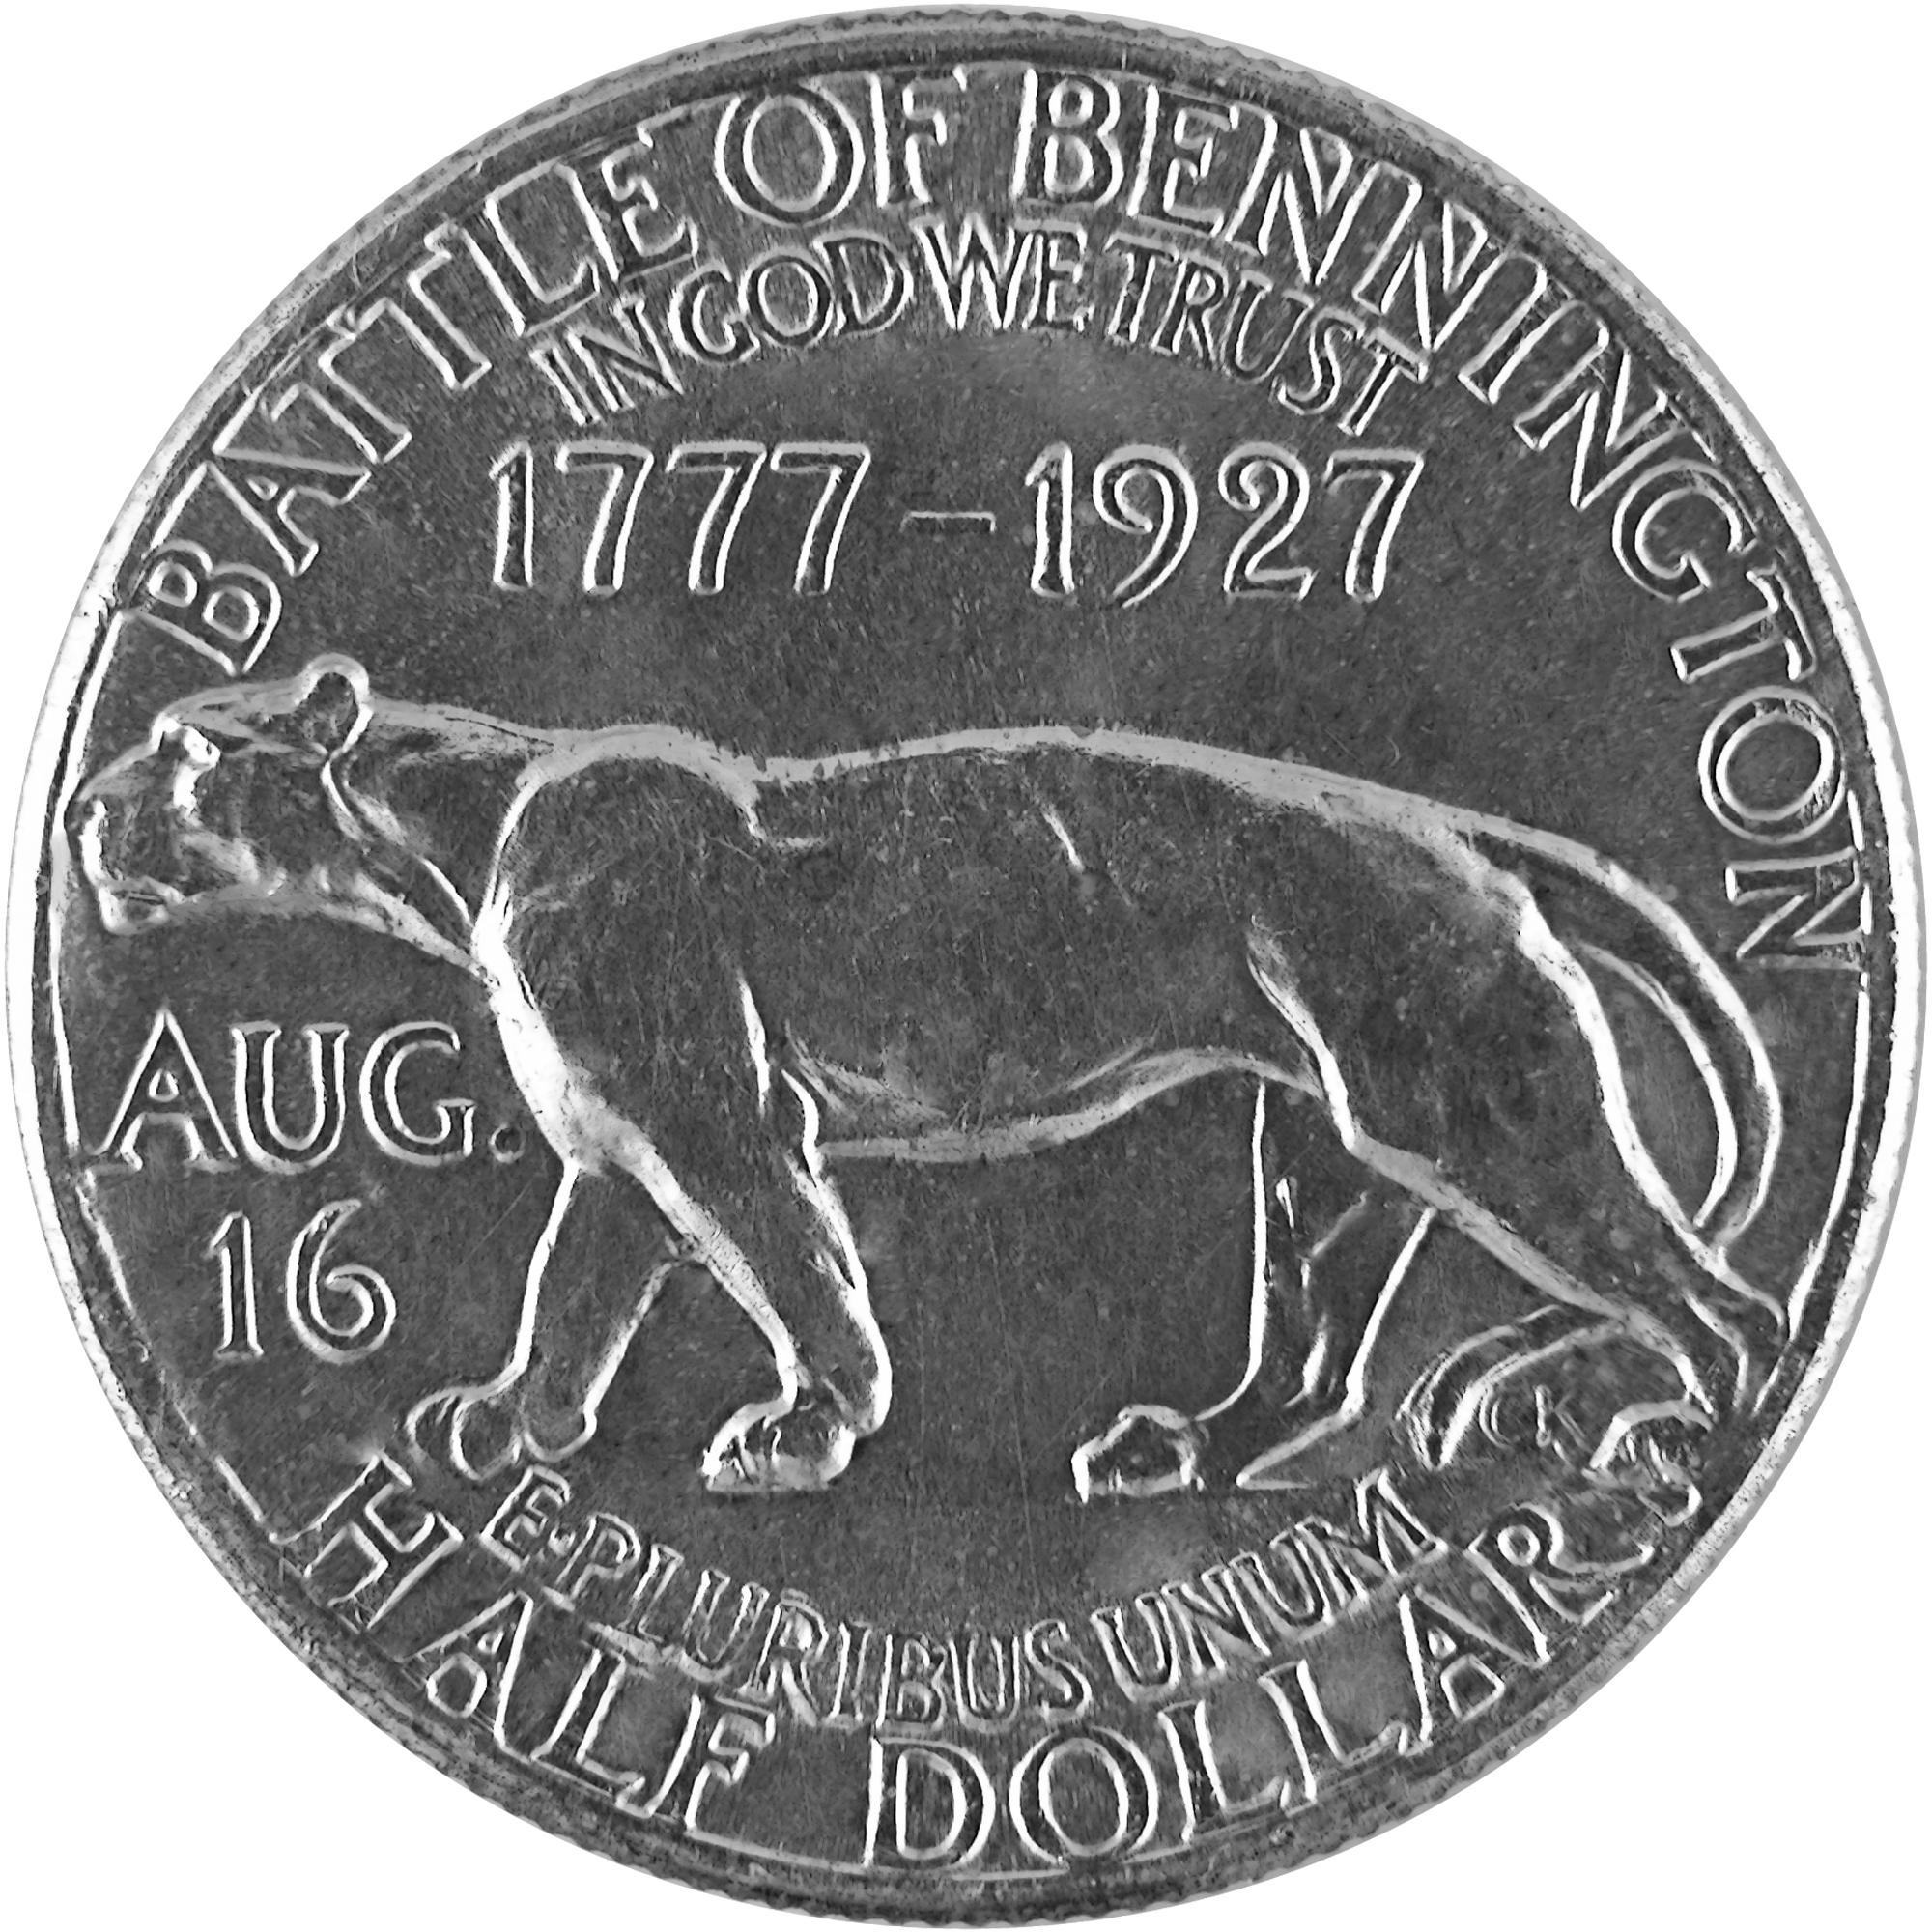 1927 Vermont Sesquicentennial Commemorative Silver Half Dollar Coin Reverse